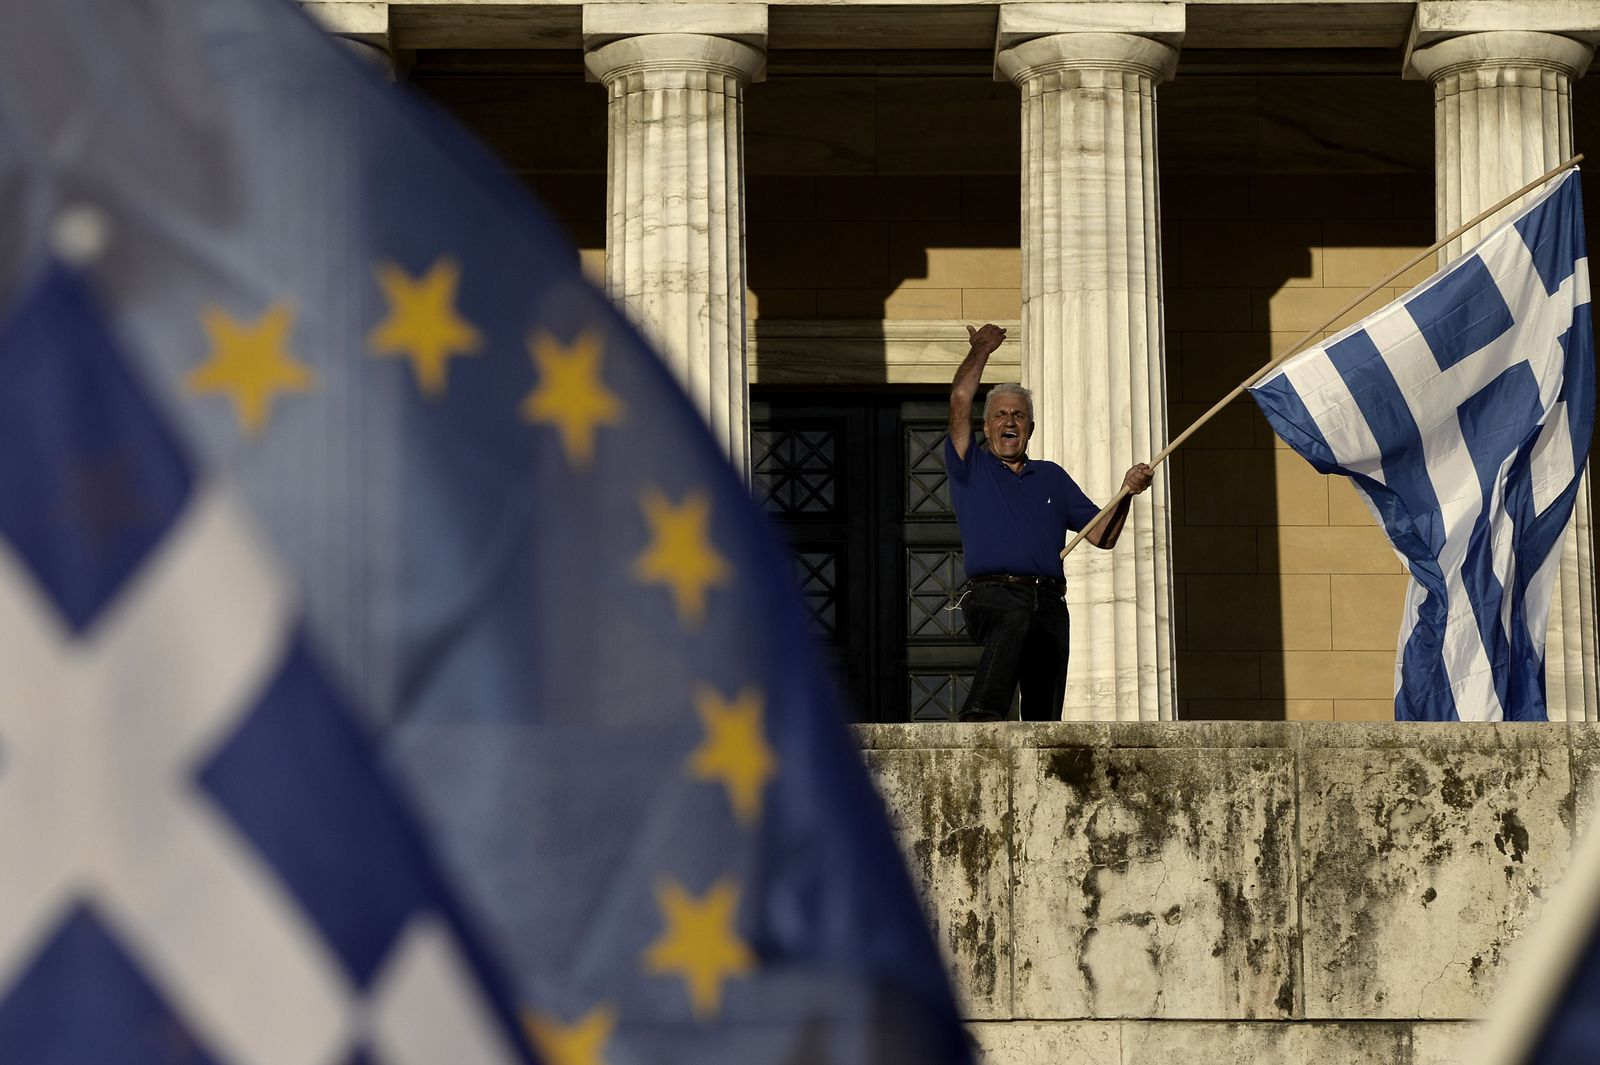 Proteste Griechenland